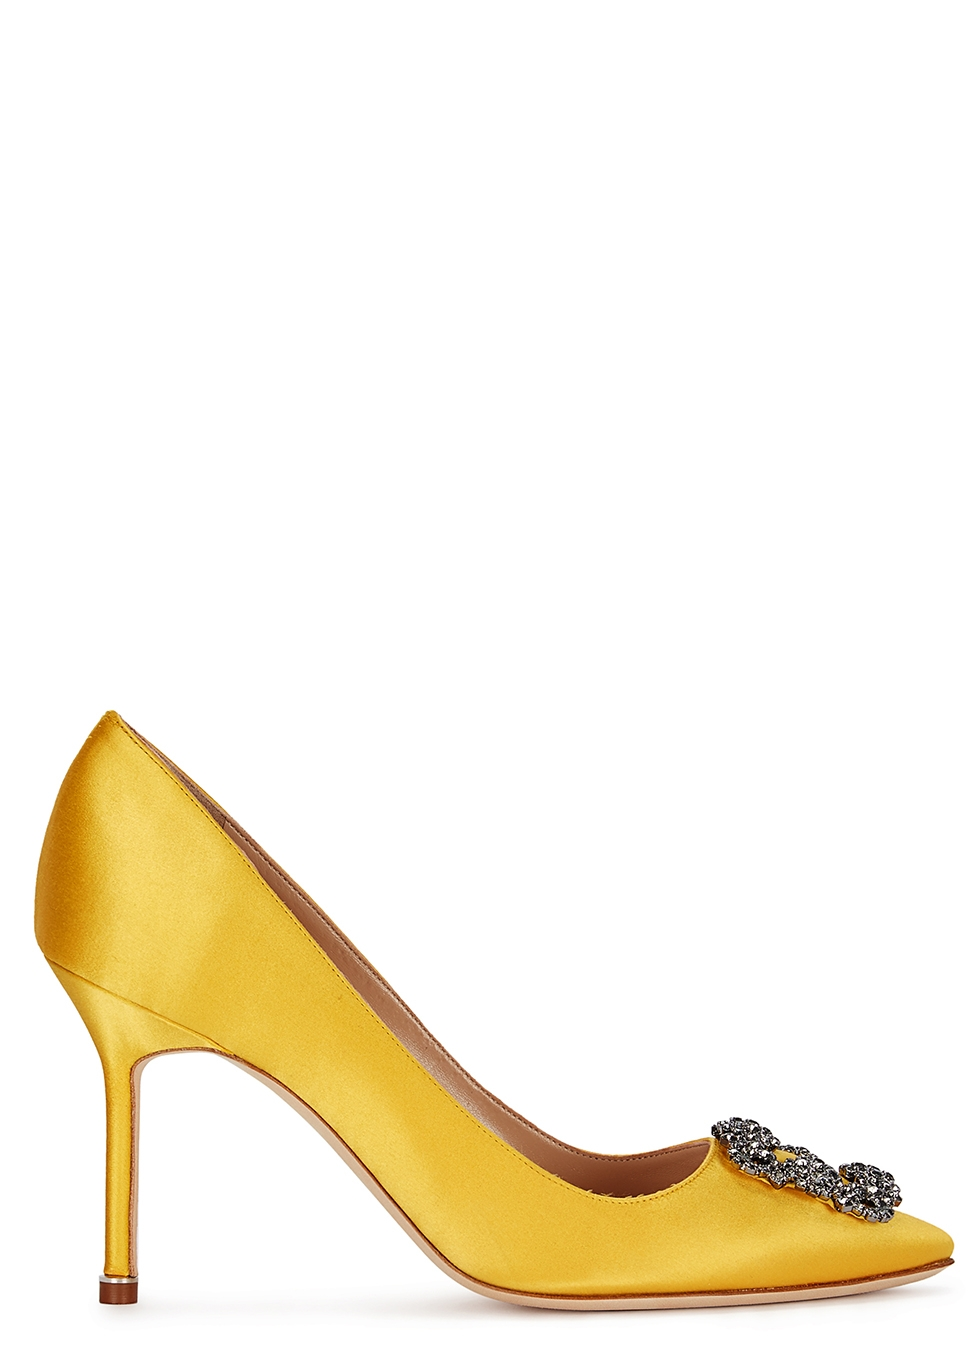 Hangisi 90 yellow silk satin pumps - Manolo Blahnik